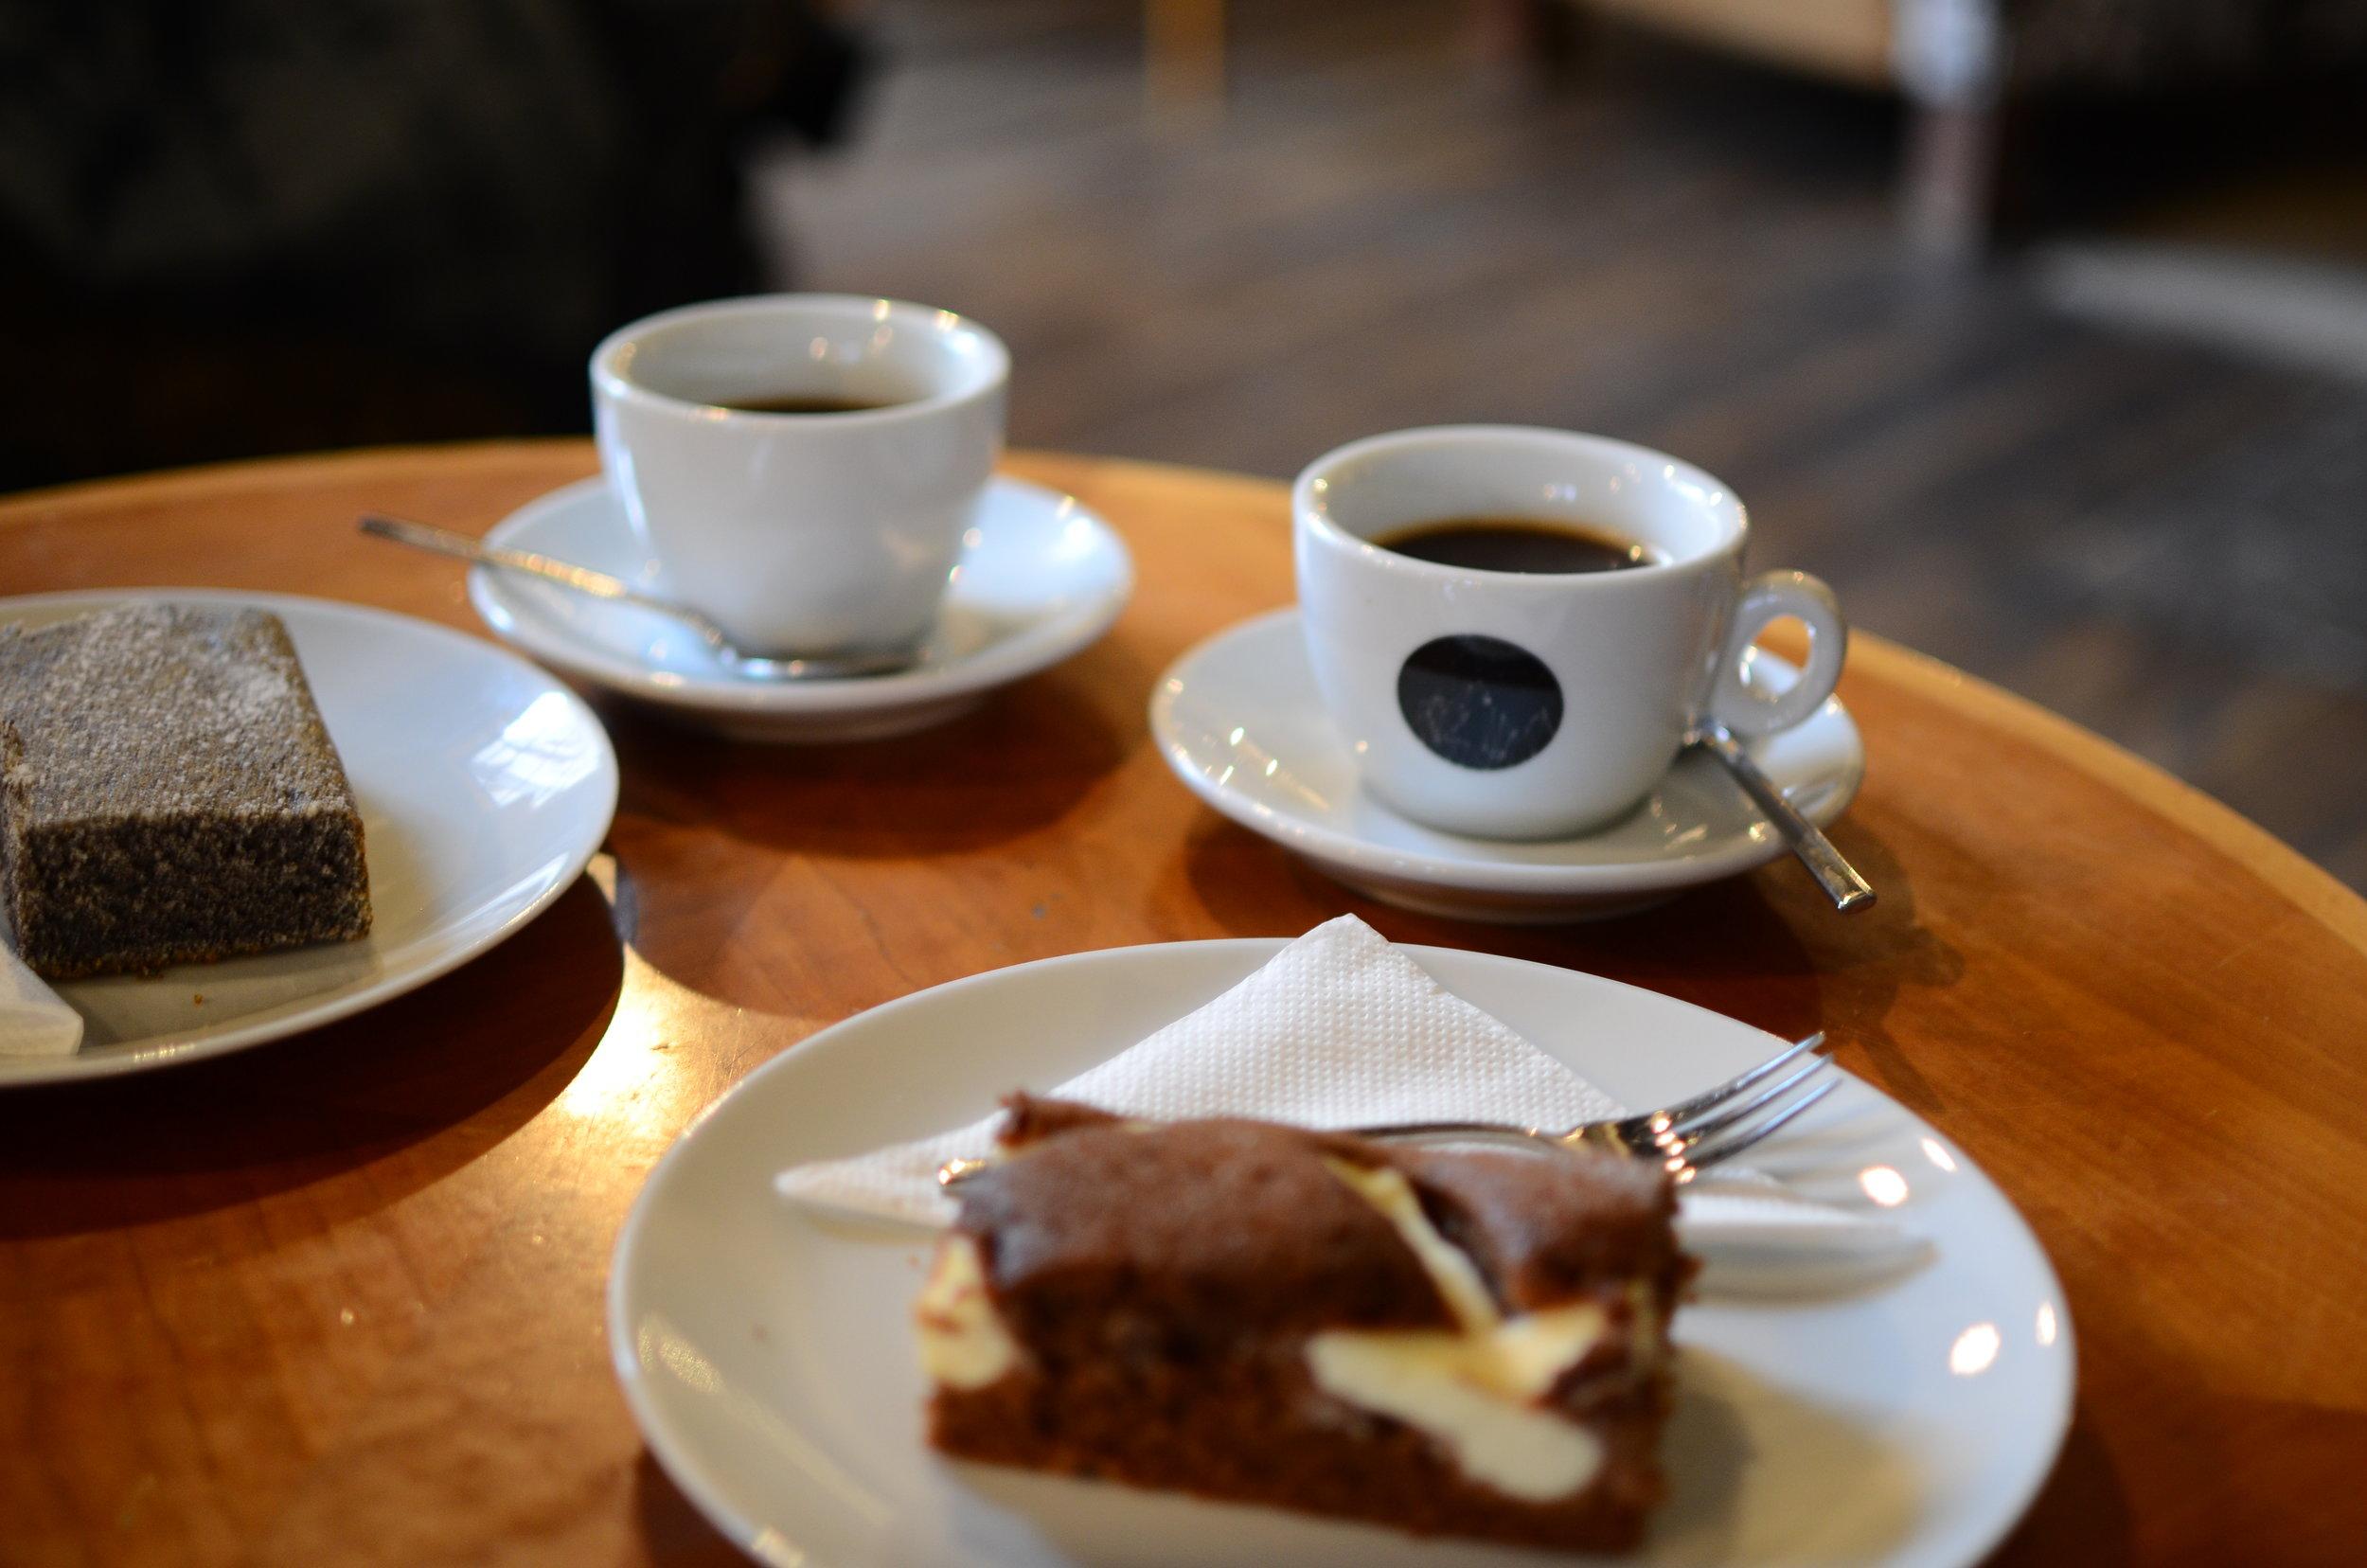 coffee and cake warm up